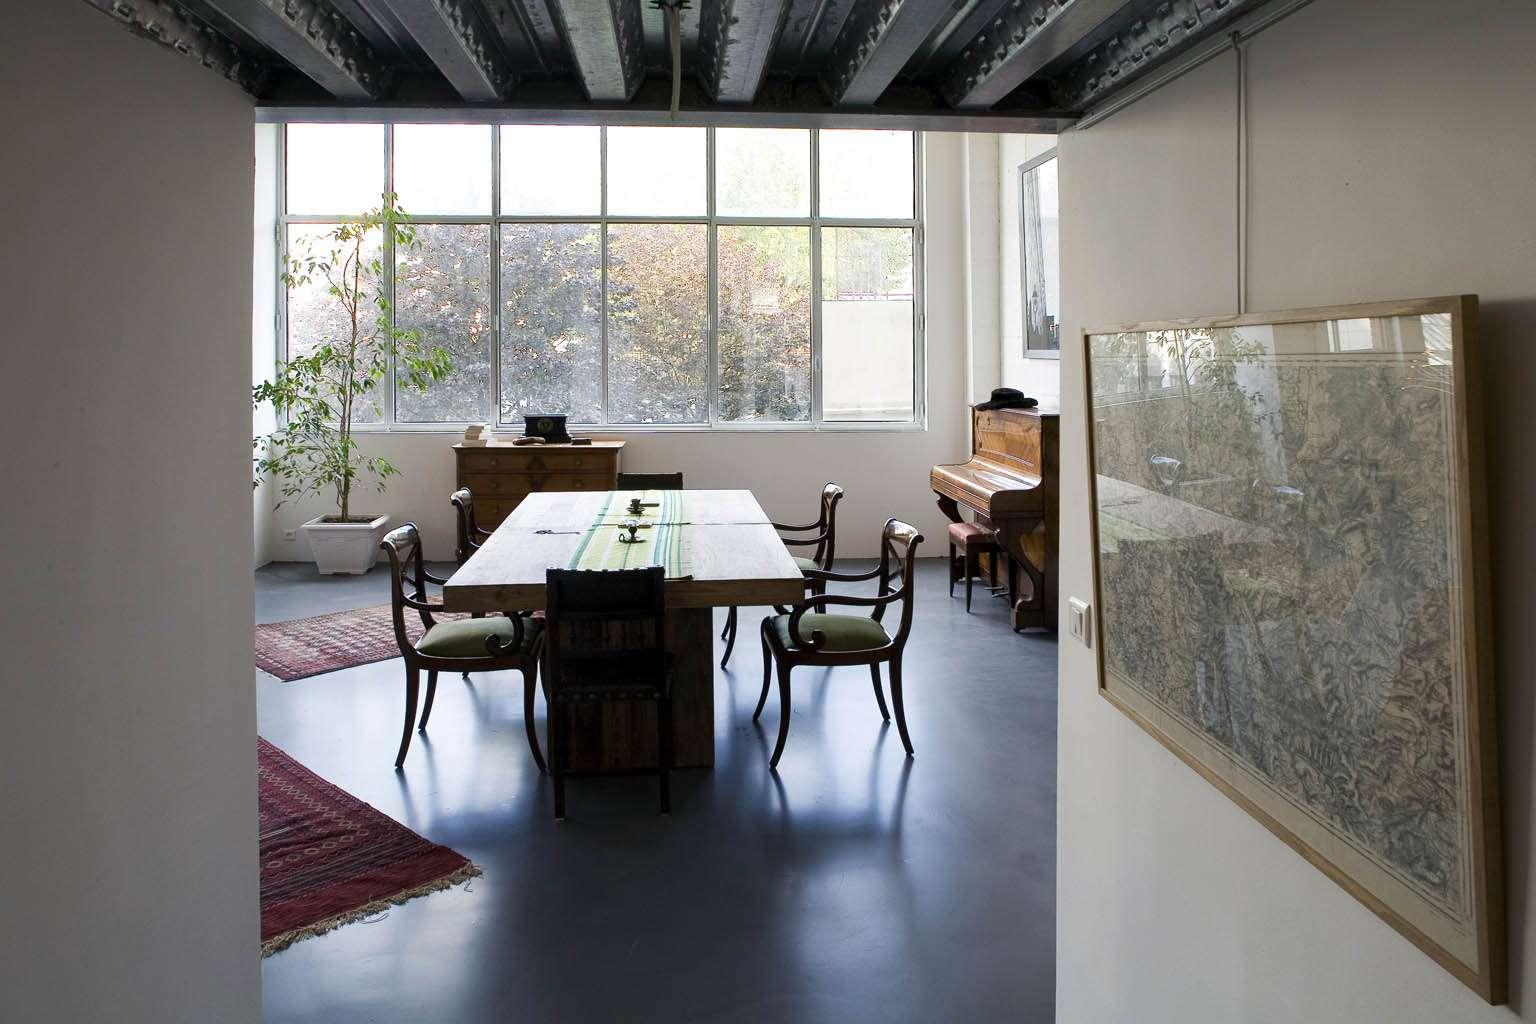 Loftparis xix fendler seemuller architectes for Amenagement jardin 250m2